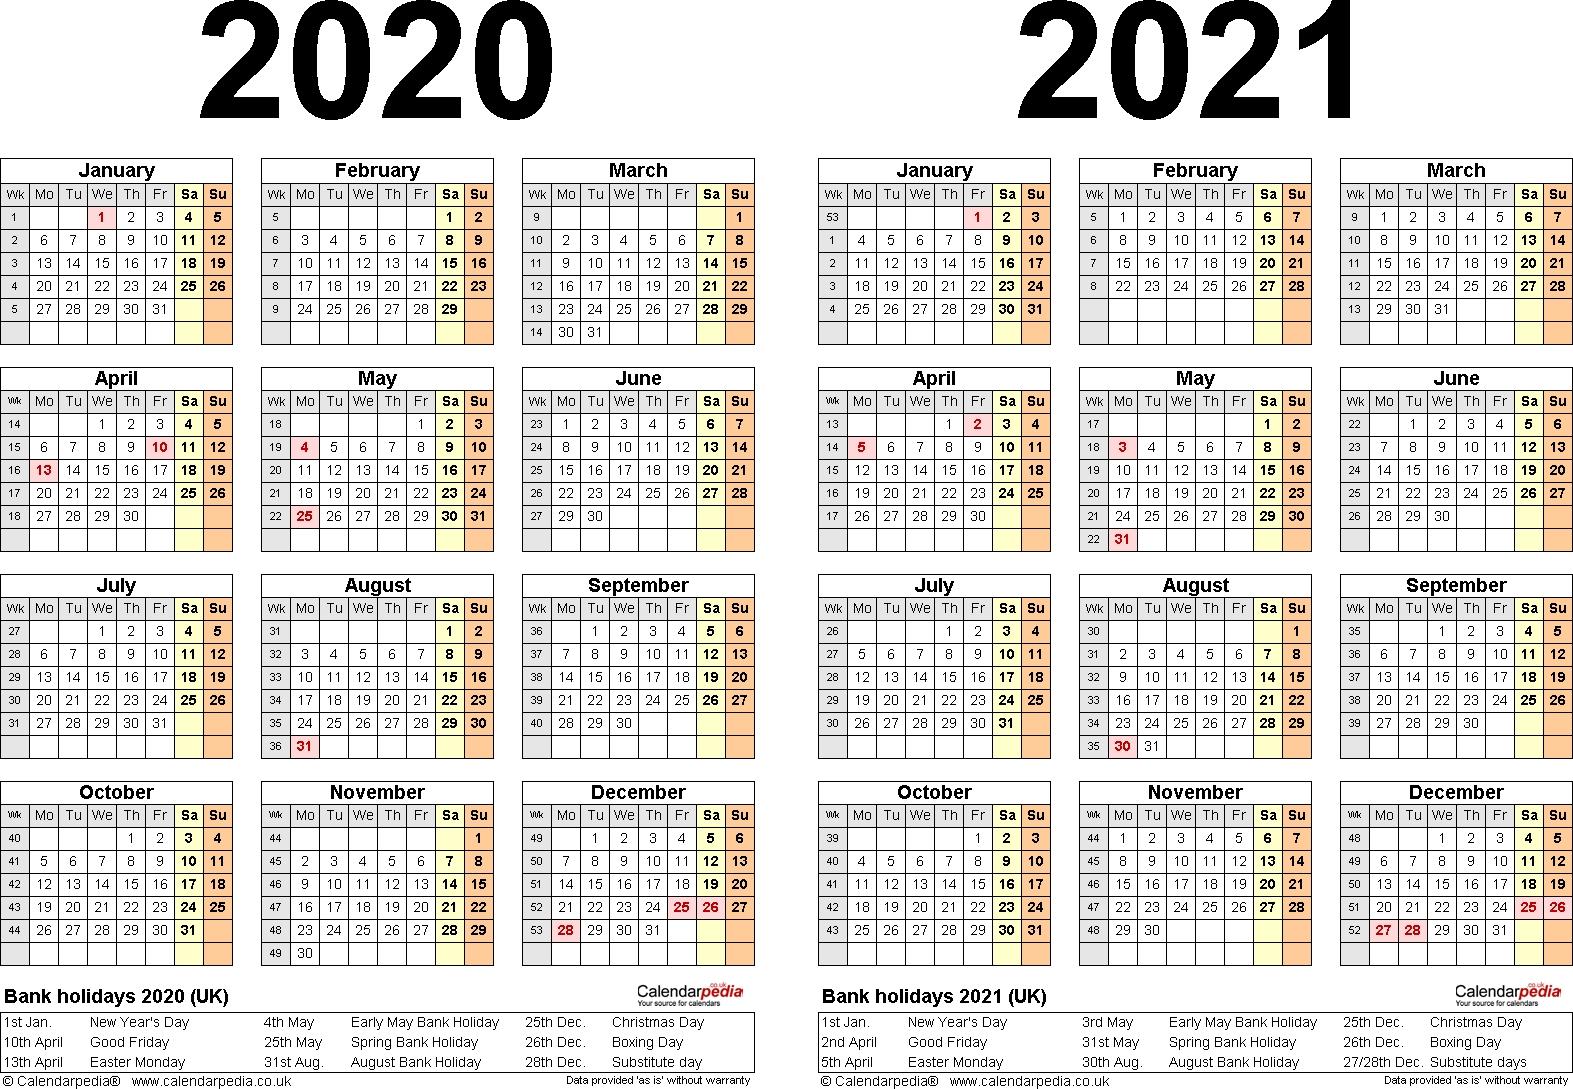 Pick Printable 2 Year Calendar 2020 2021 | Calendar Printables Free Blank-Midwest 2021 Whitetail Rut Predictions